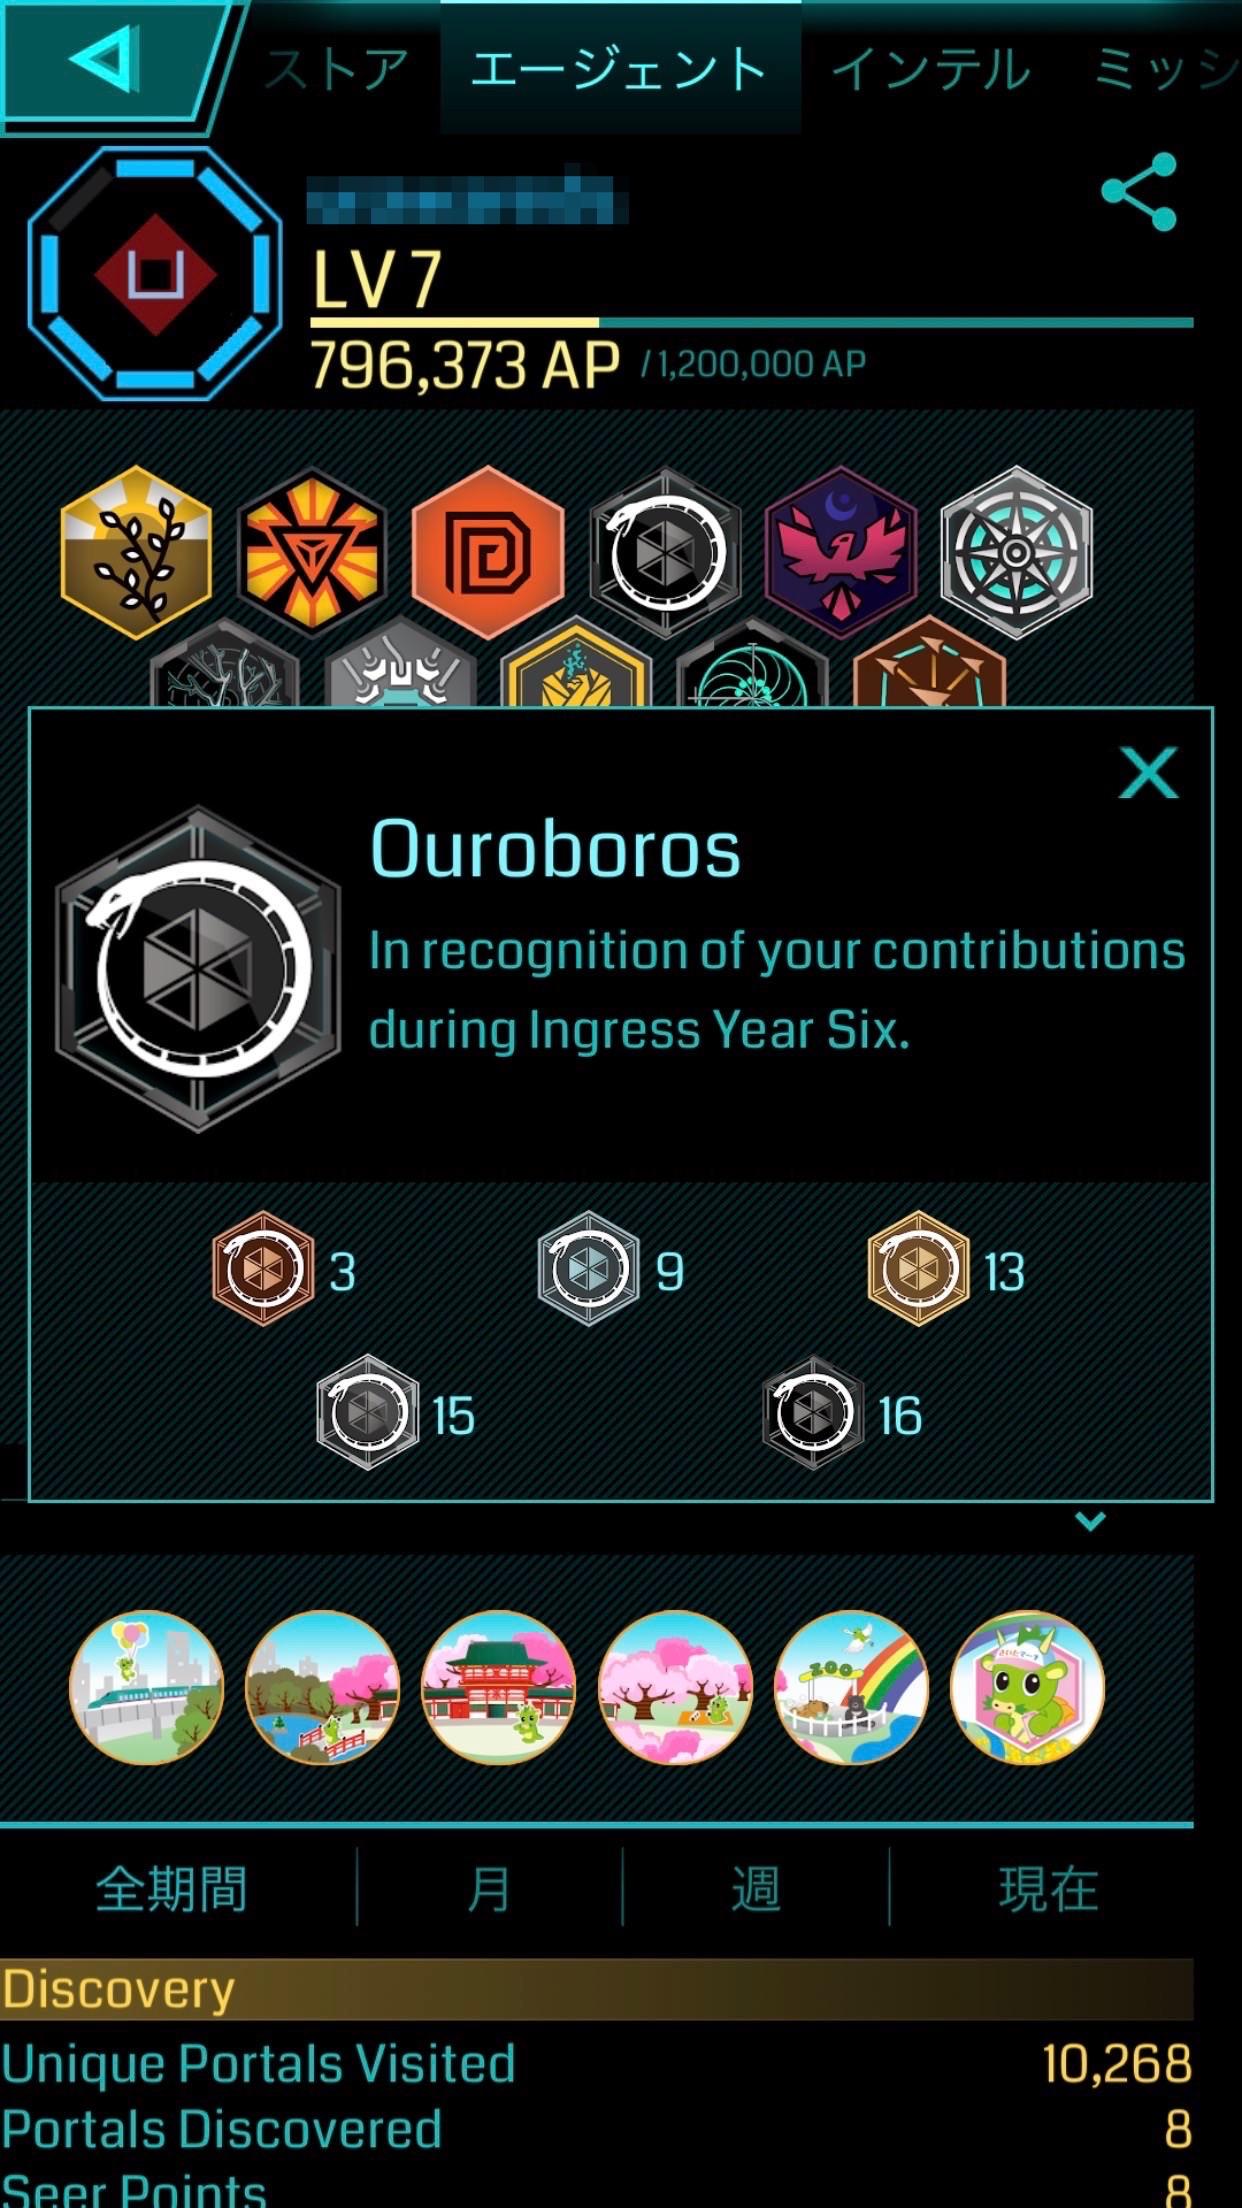 【Ingress】6周年記念メダル「Ouroboros」配布開始